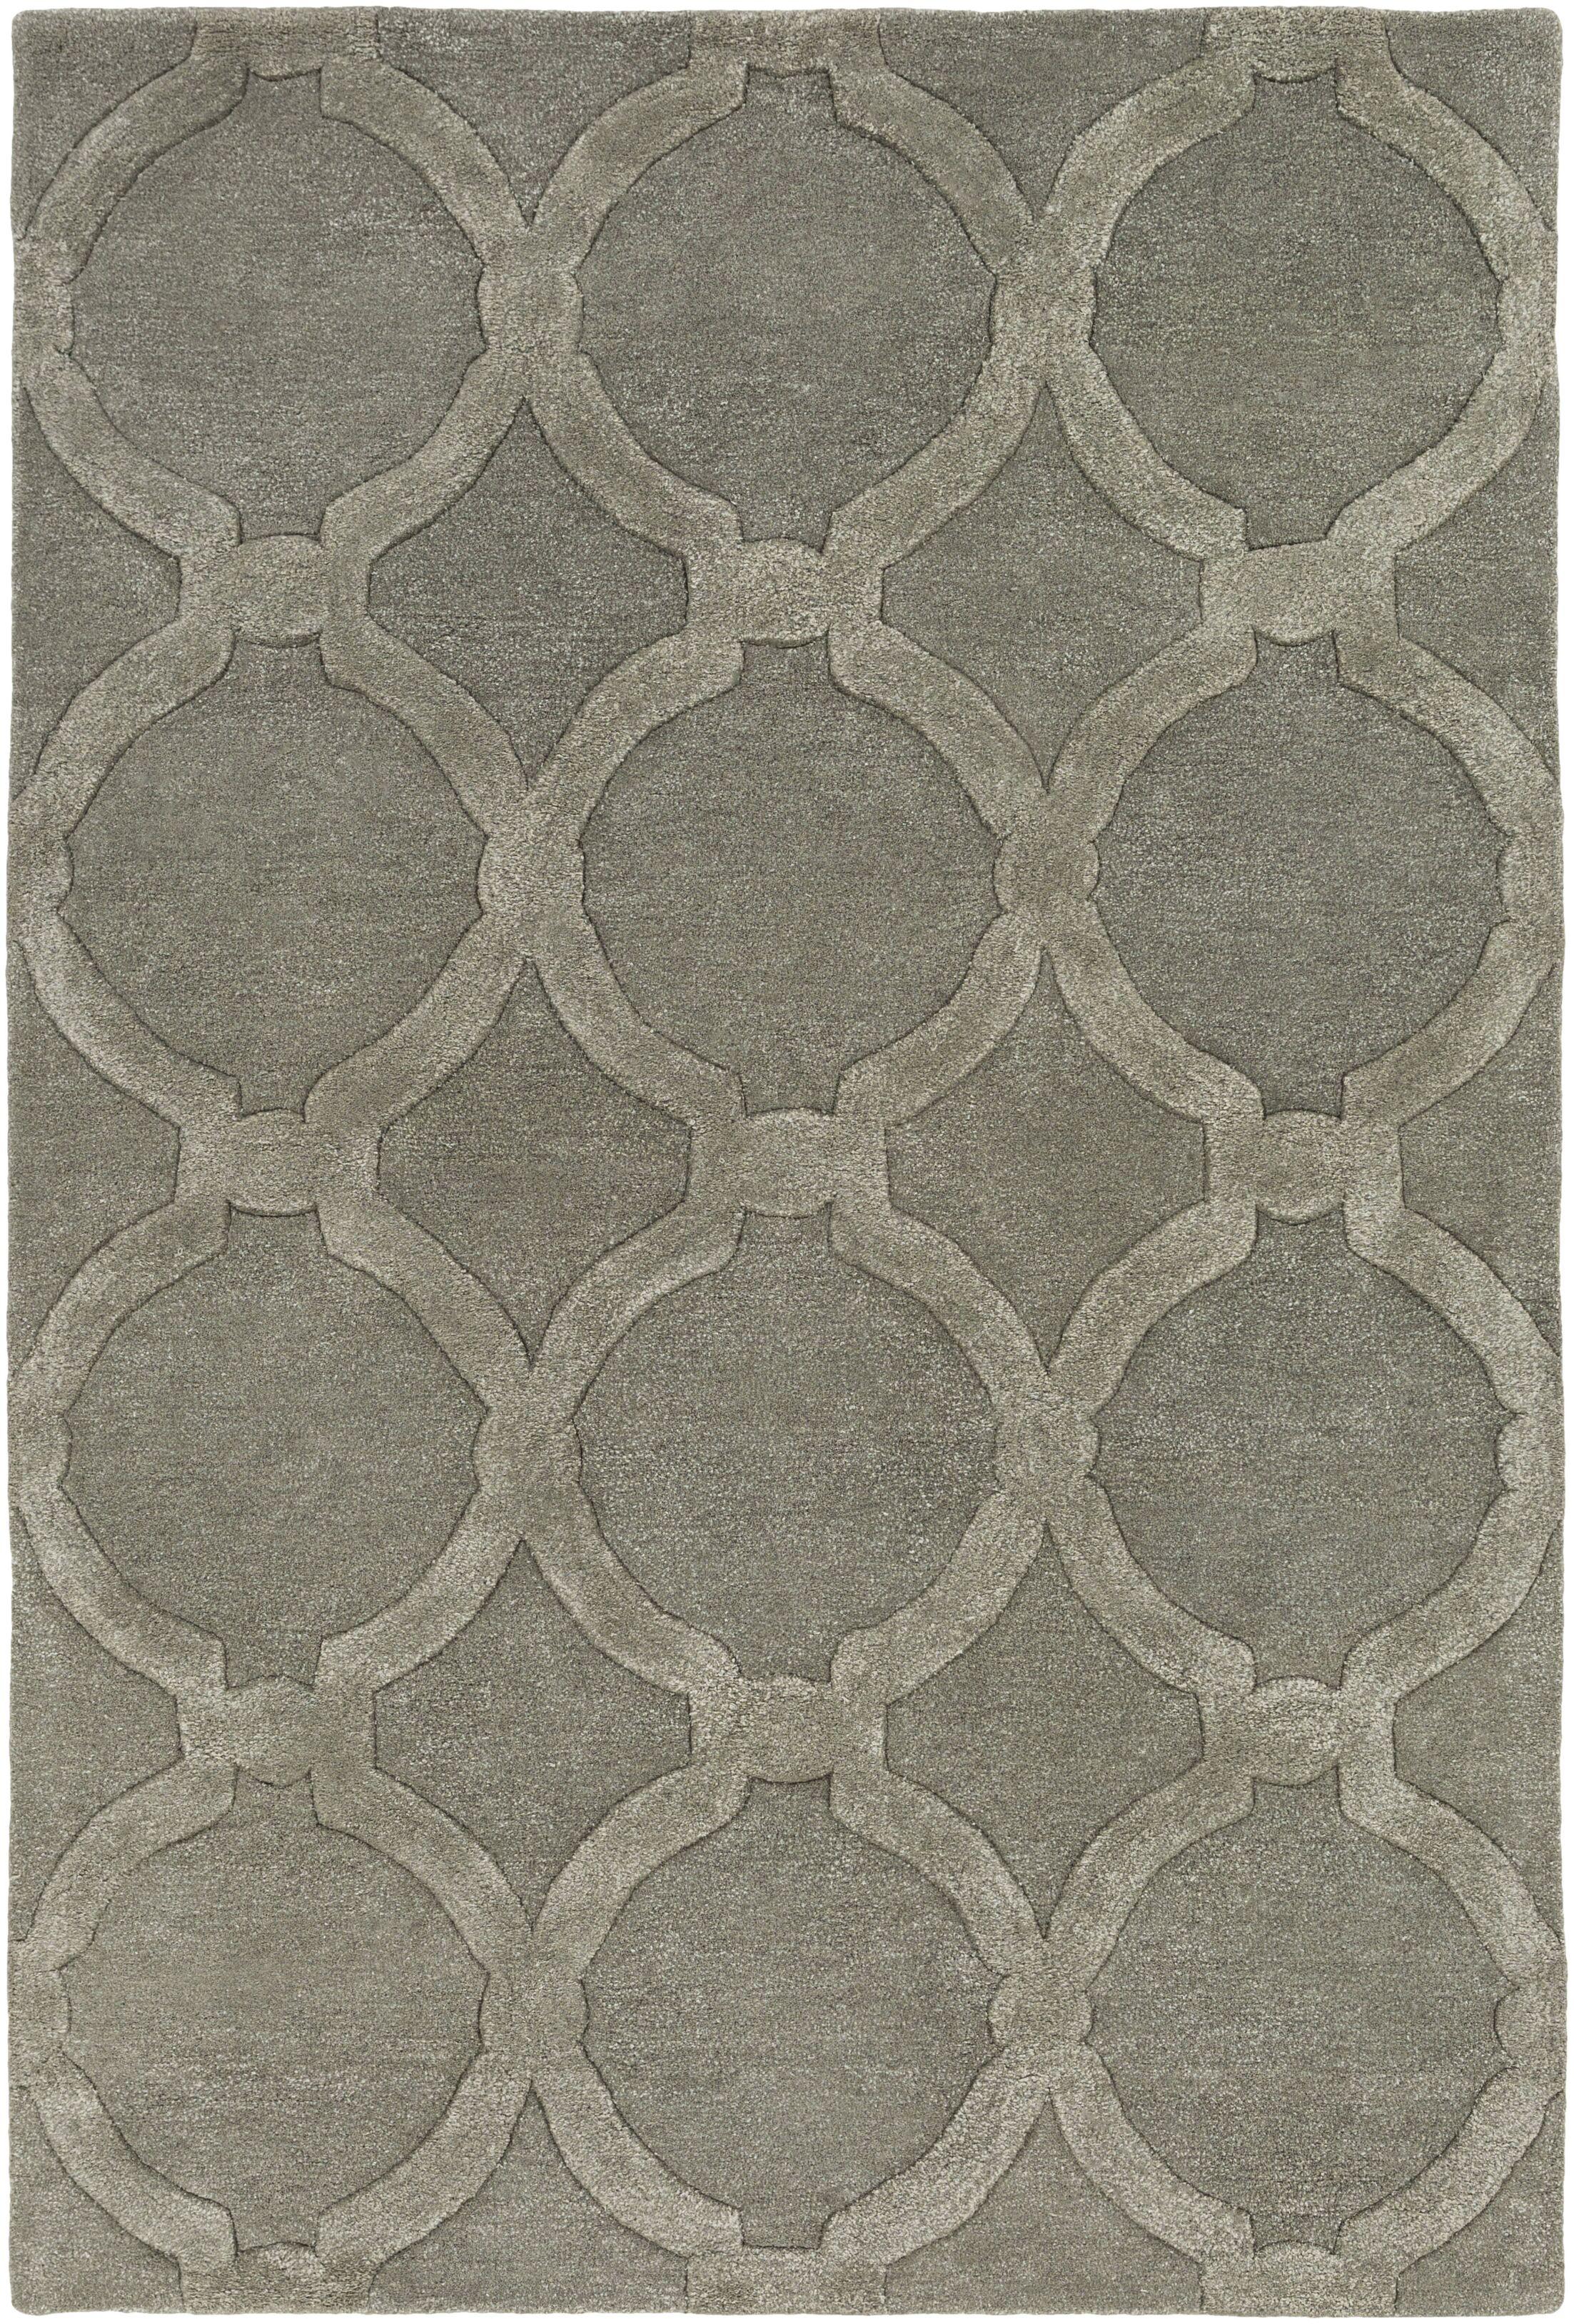 Labastide Hand-Tufted Charcoal Area Rug Rug Size: Rectangle 5' x 7'6